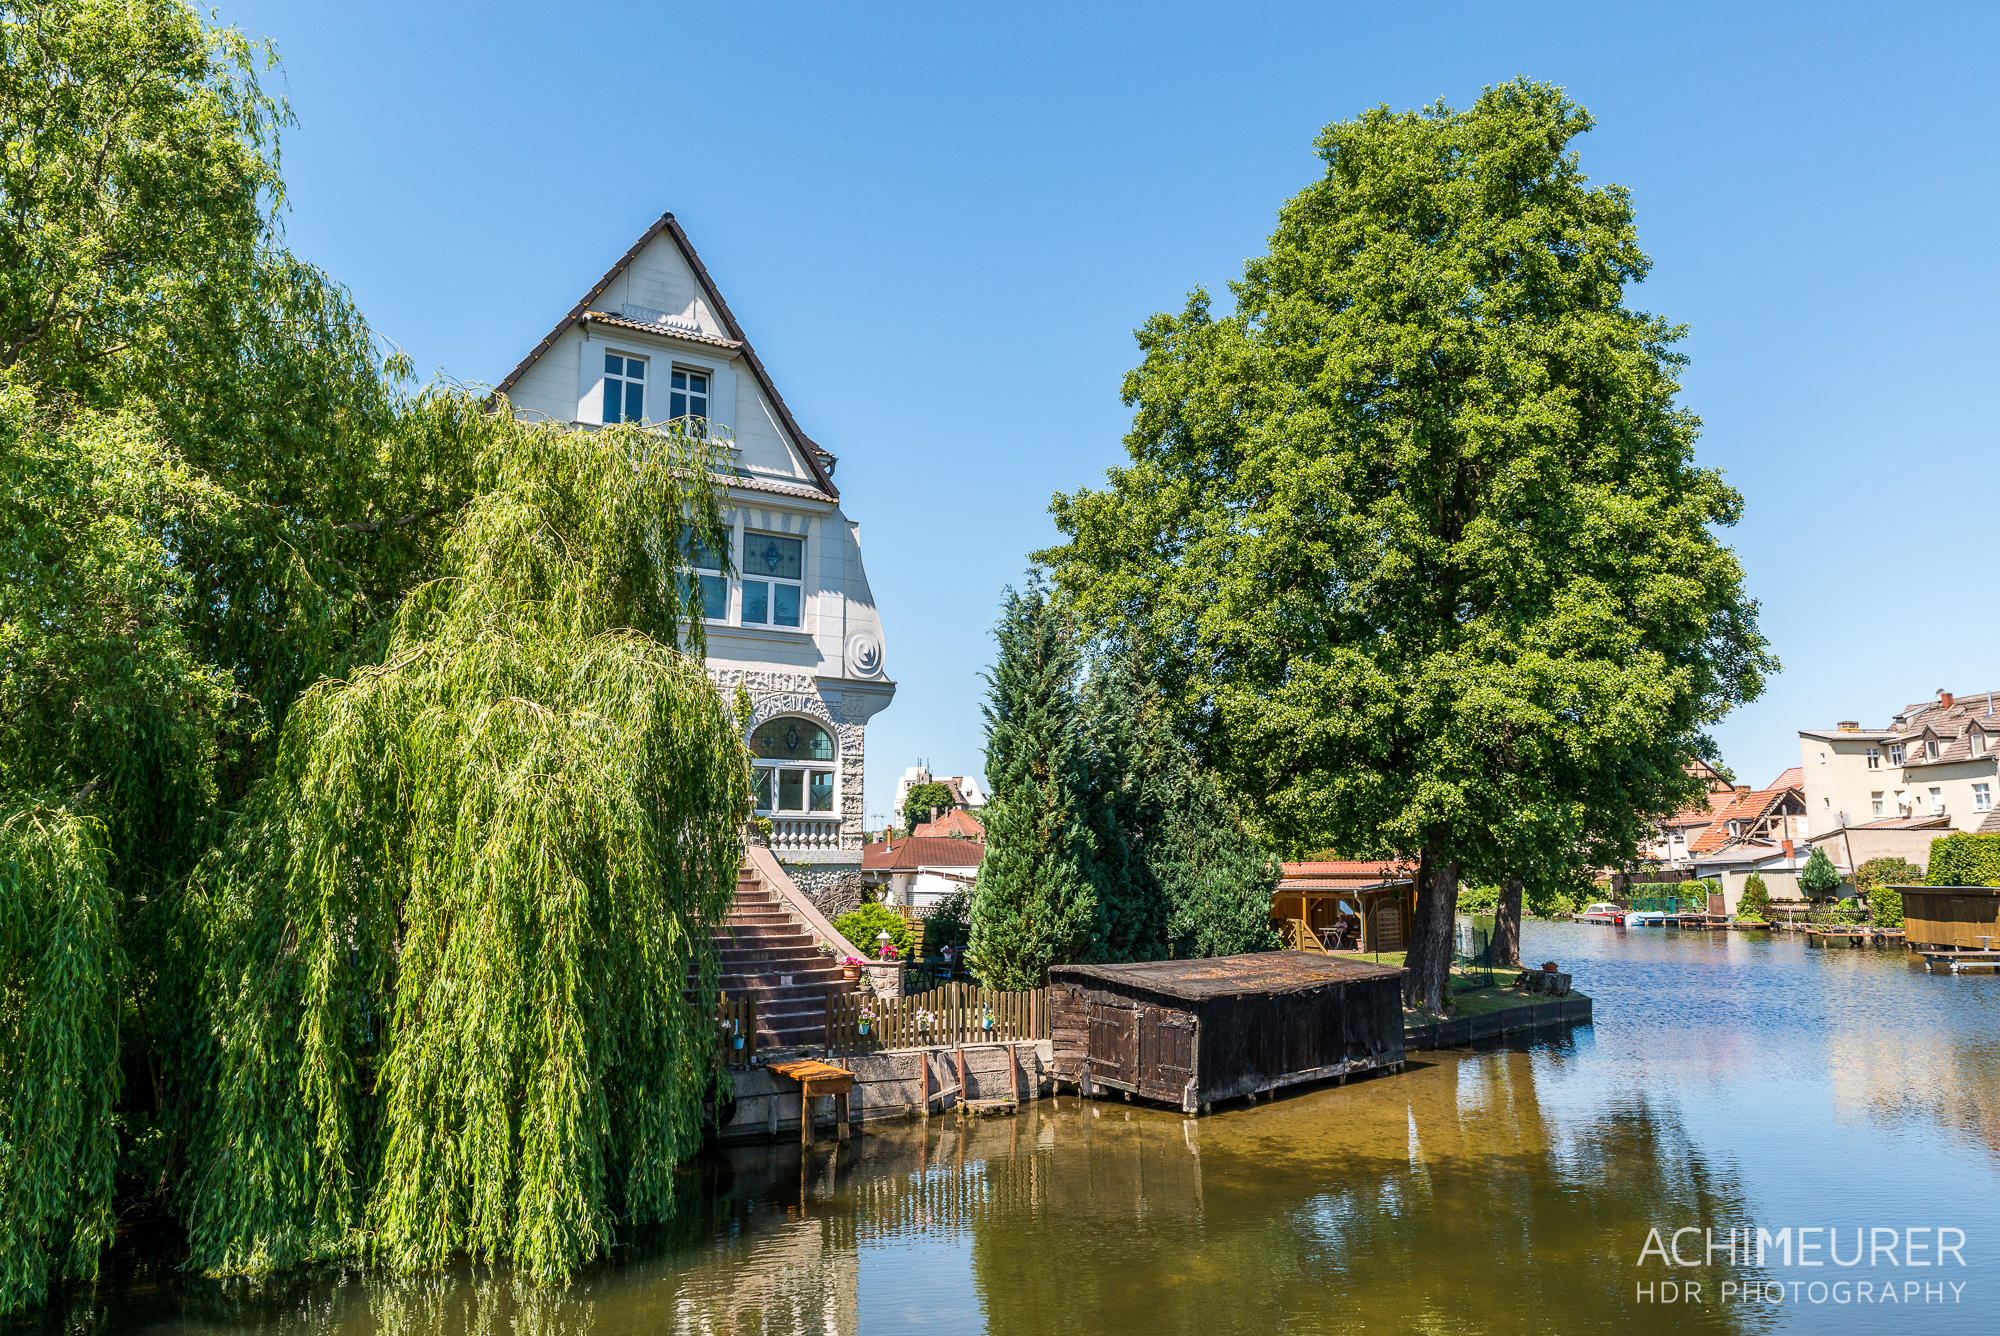 Hausboot-Kuhnle-Mueritz-Mecklenburg-Vorpommern-See_3159